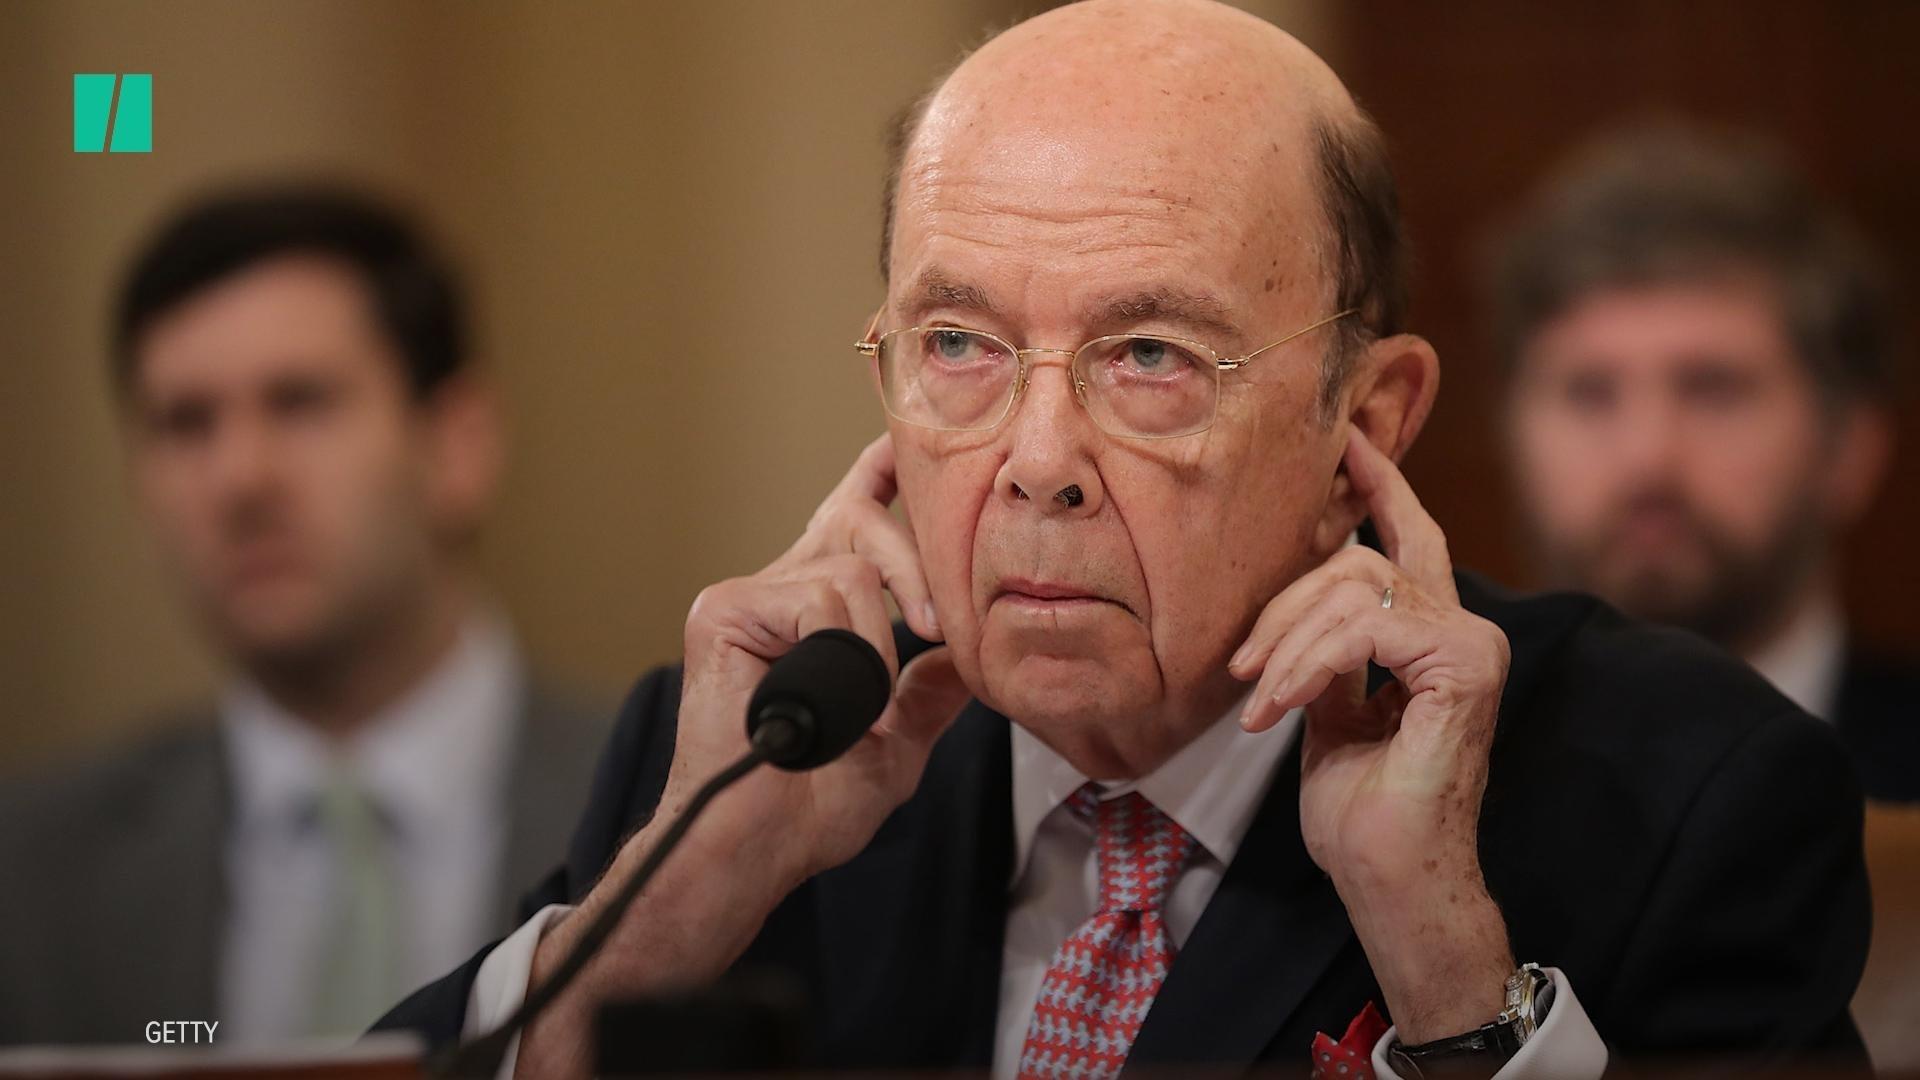 Secretary Of Commerce Wilbur Ross Doesn't Understand Shutdown Fuss